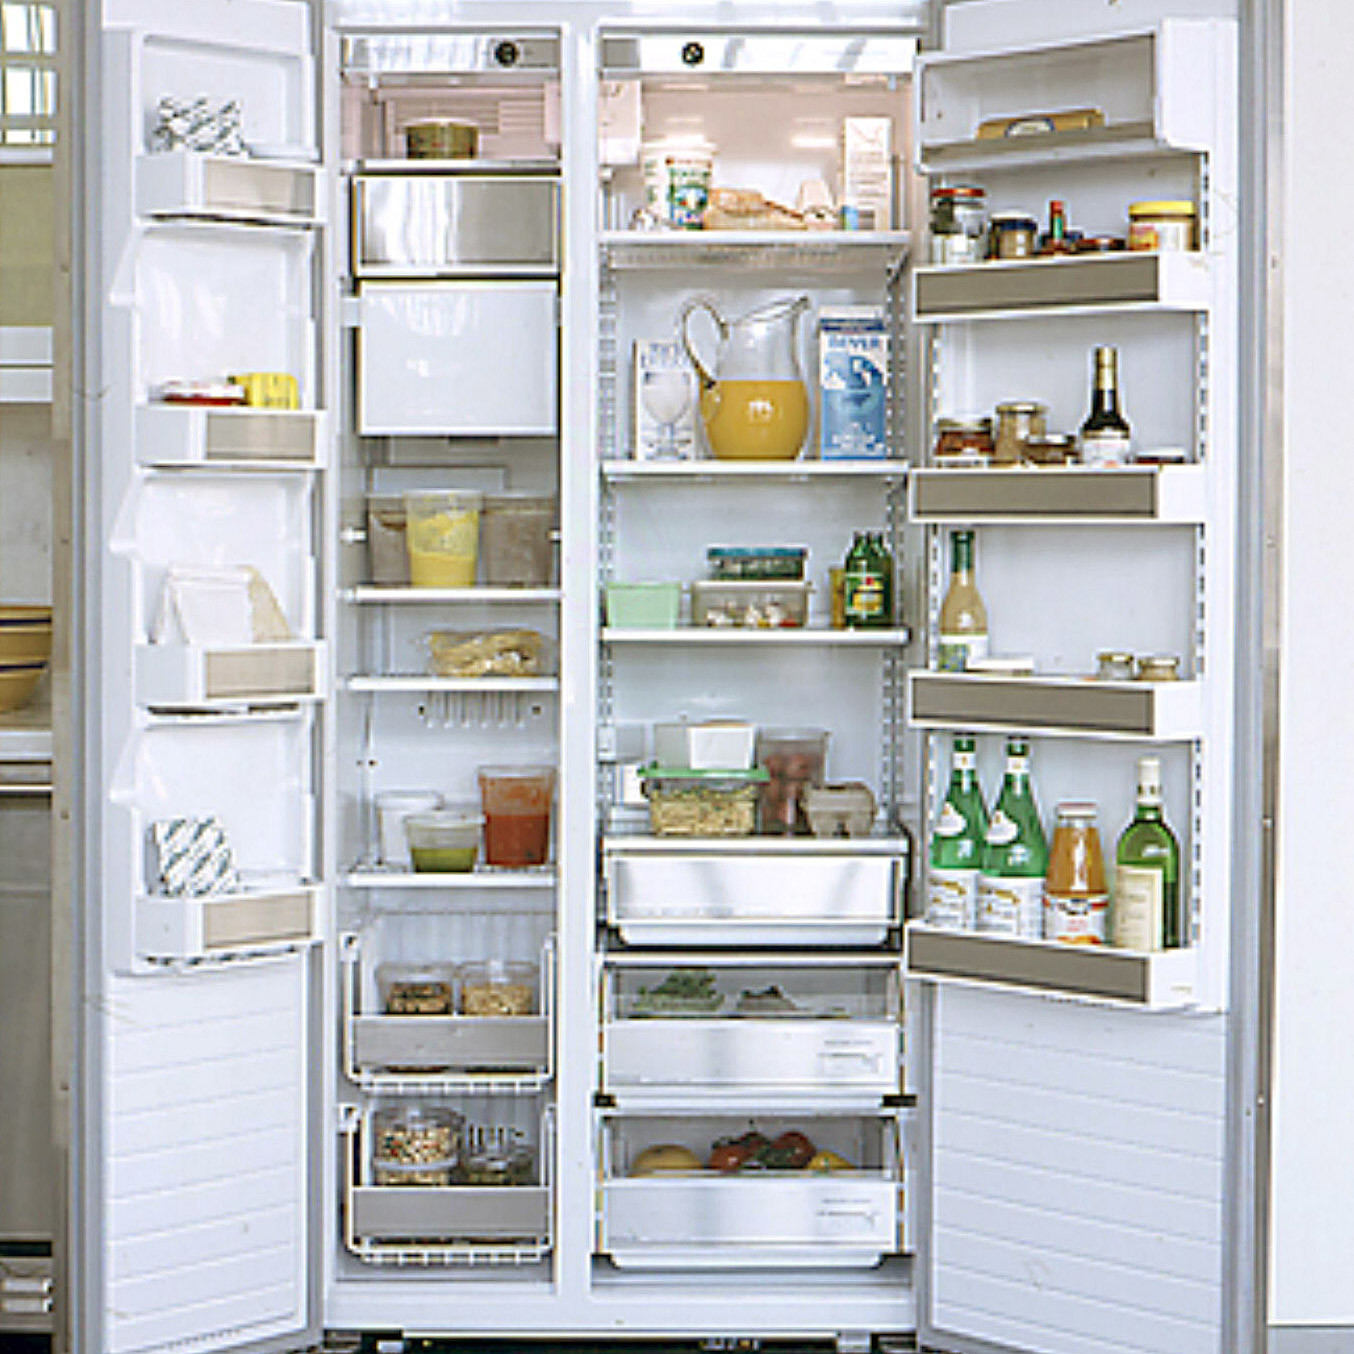 Cleaning Your Fridge | Martha Stewart on whirlpool refrigerator shelf, kenmore refrigerator shelf, frigidaire refrigerator shelf, samsung refrigerator shelf, amana refrigerator shelf,